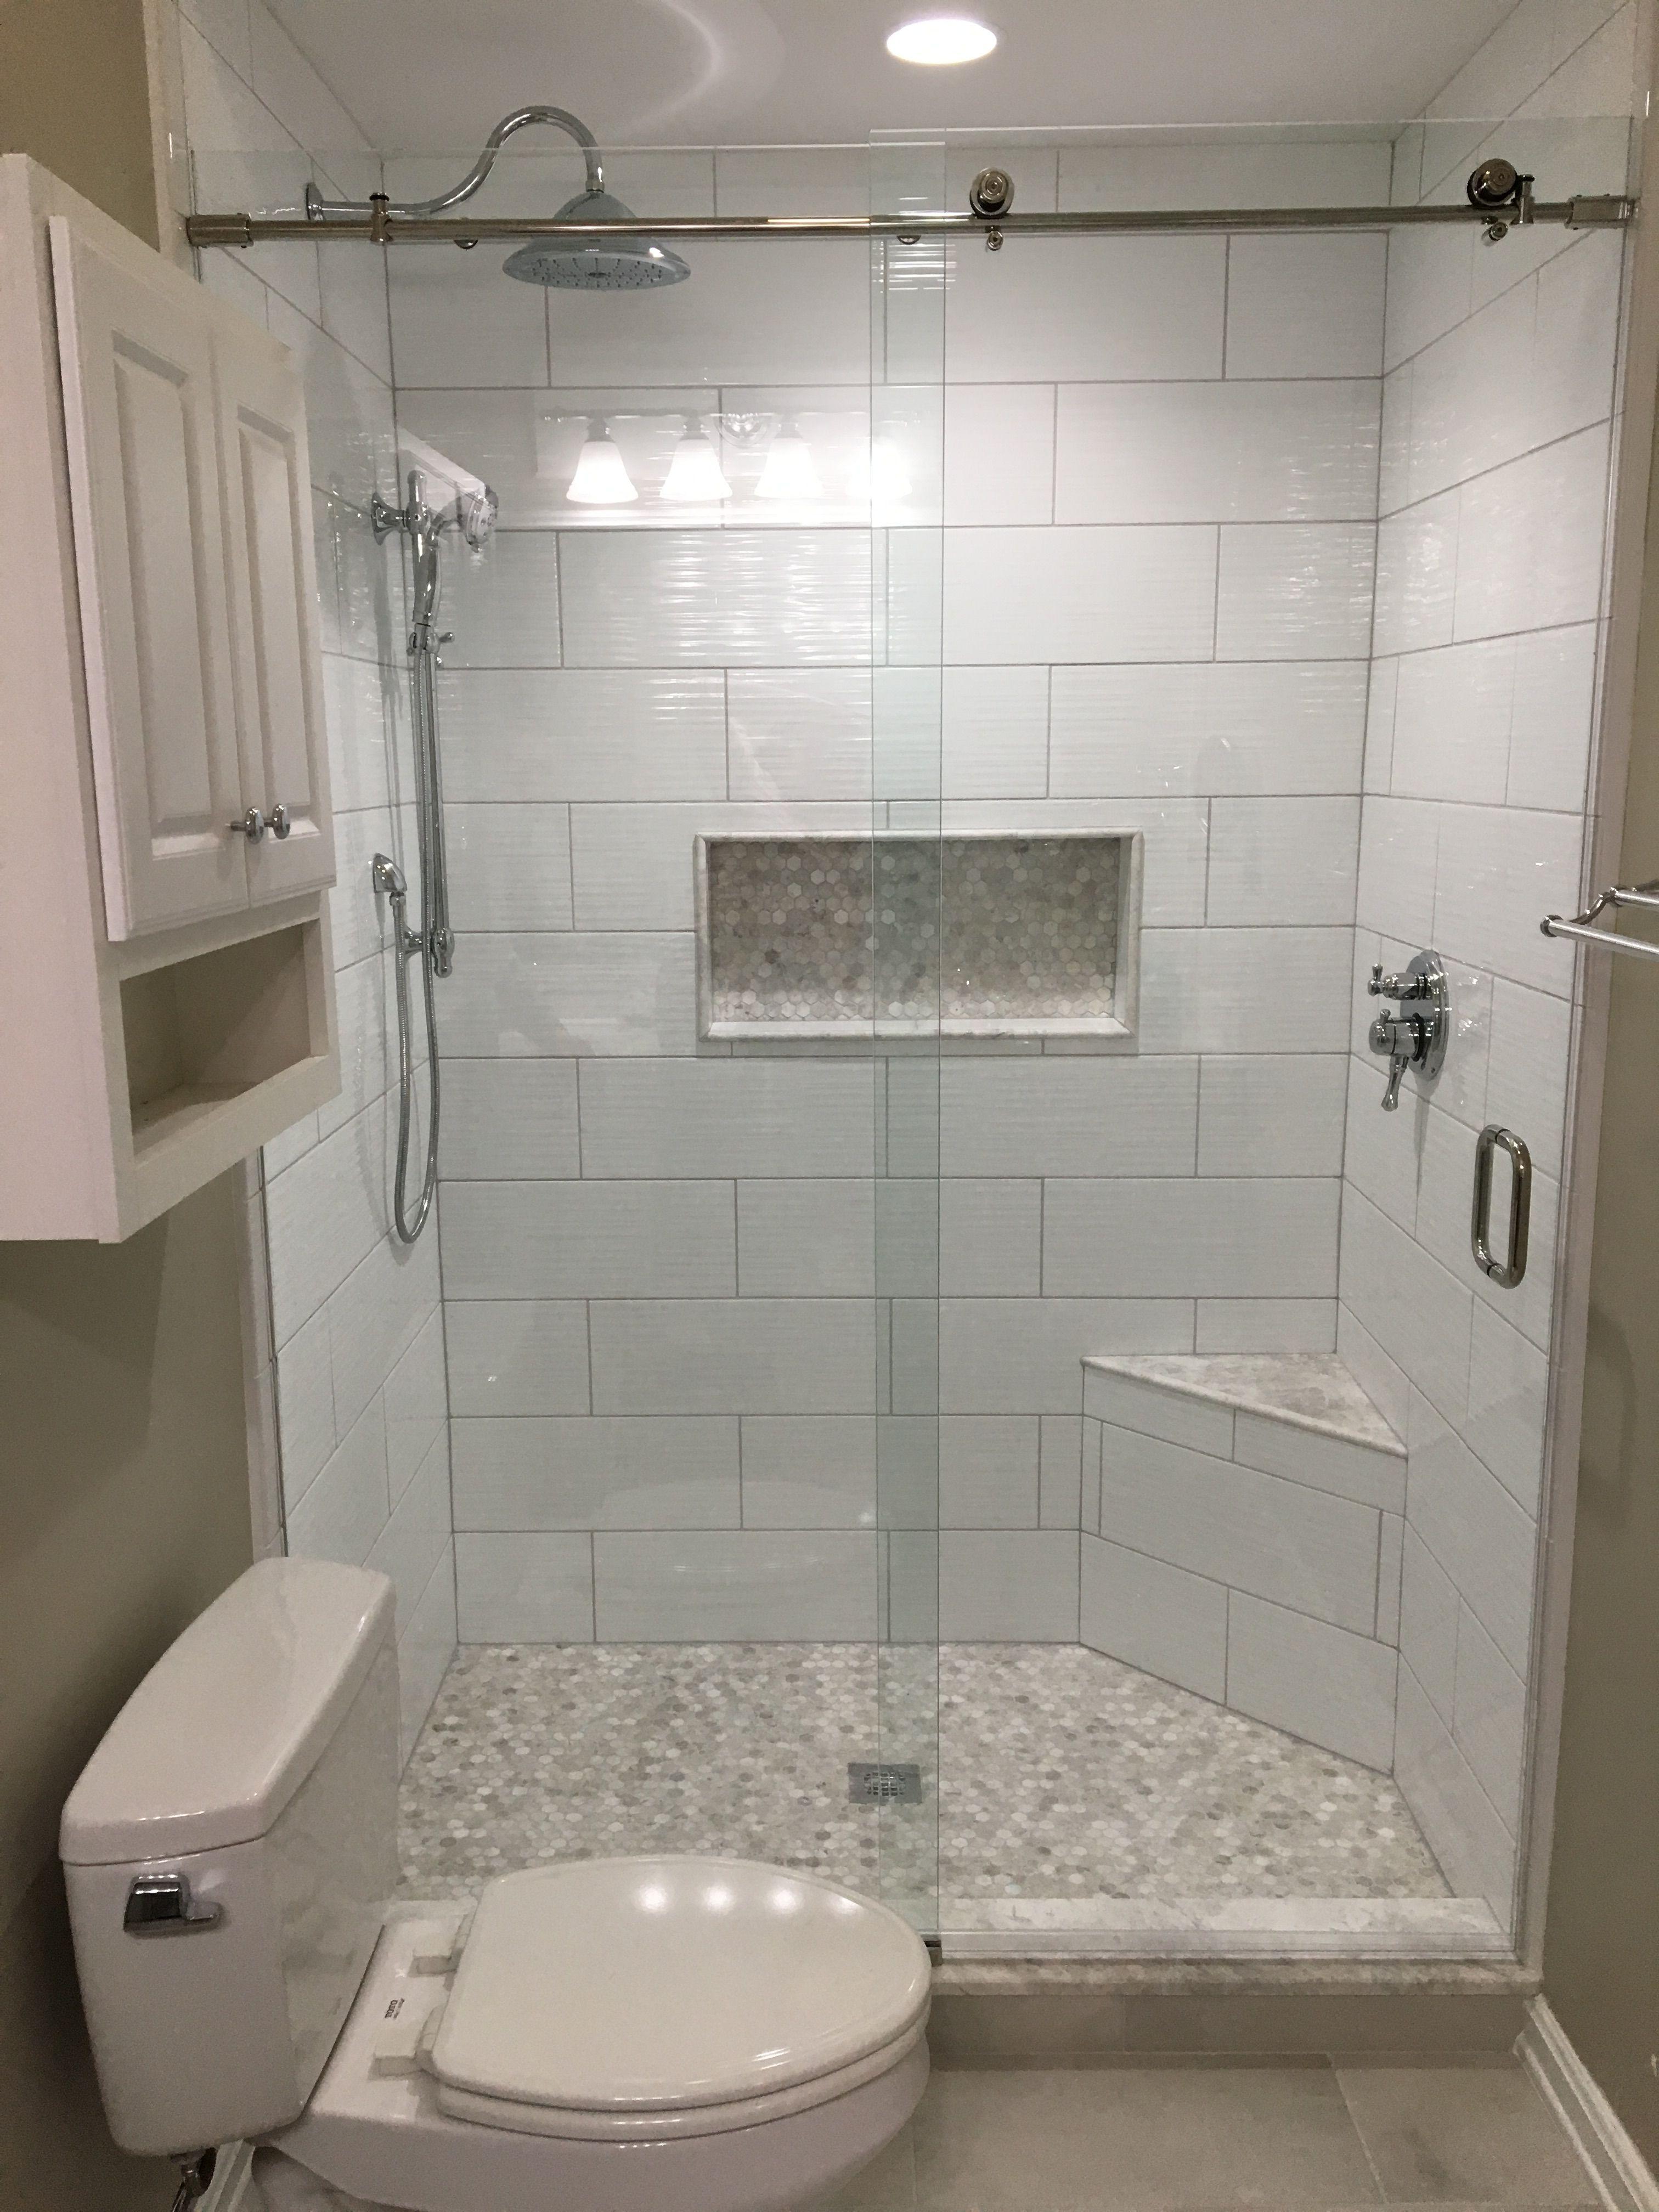 Master Bath Remodel By Dicaro Llc Master Bathroom Shower Bath Remodel Bathroom Remodel Master